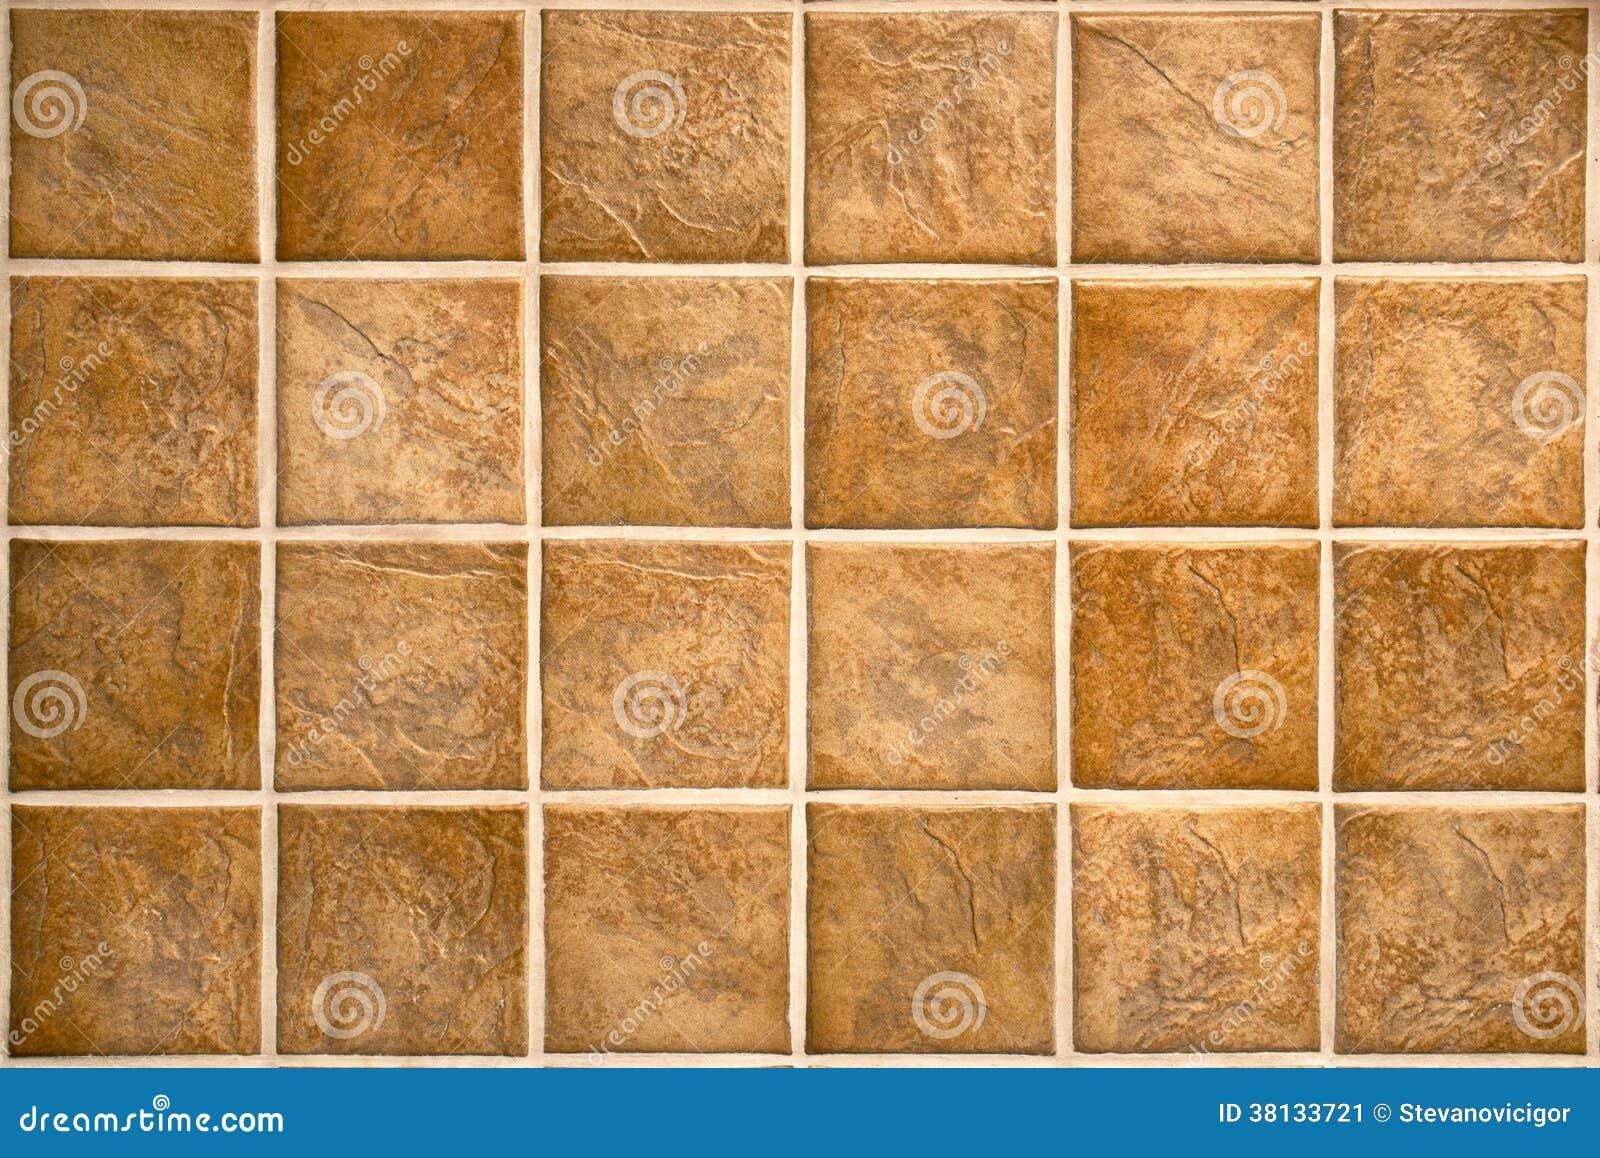 Piastrelle di ceramica beige del mosaico per la parete o - Piastrelle di ceramica ...